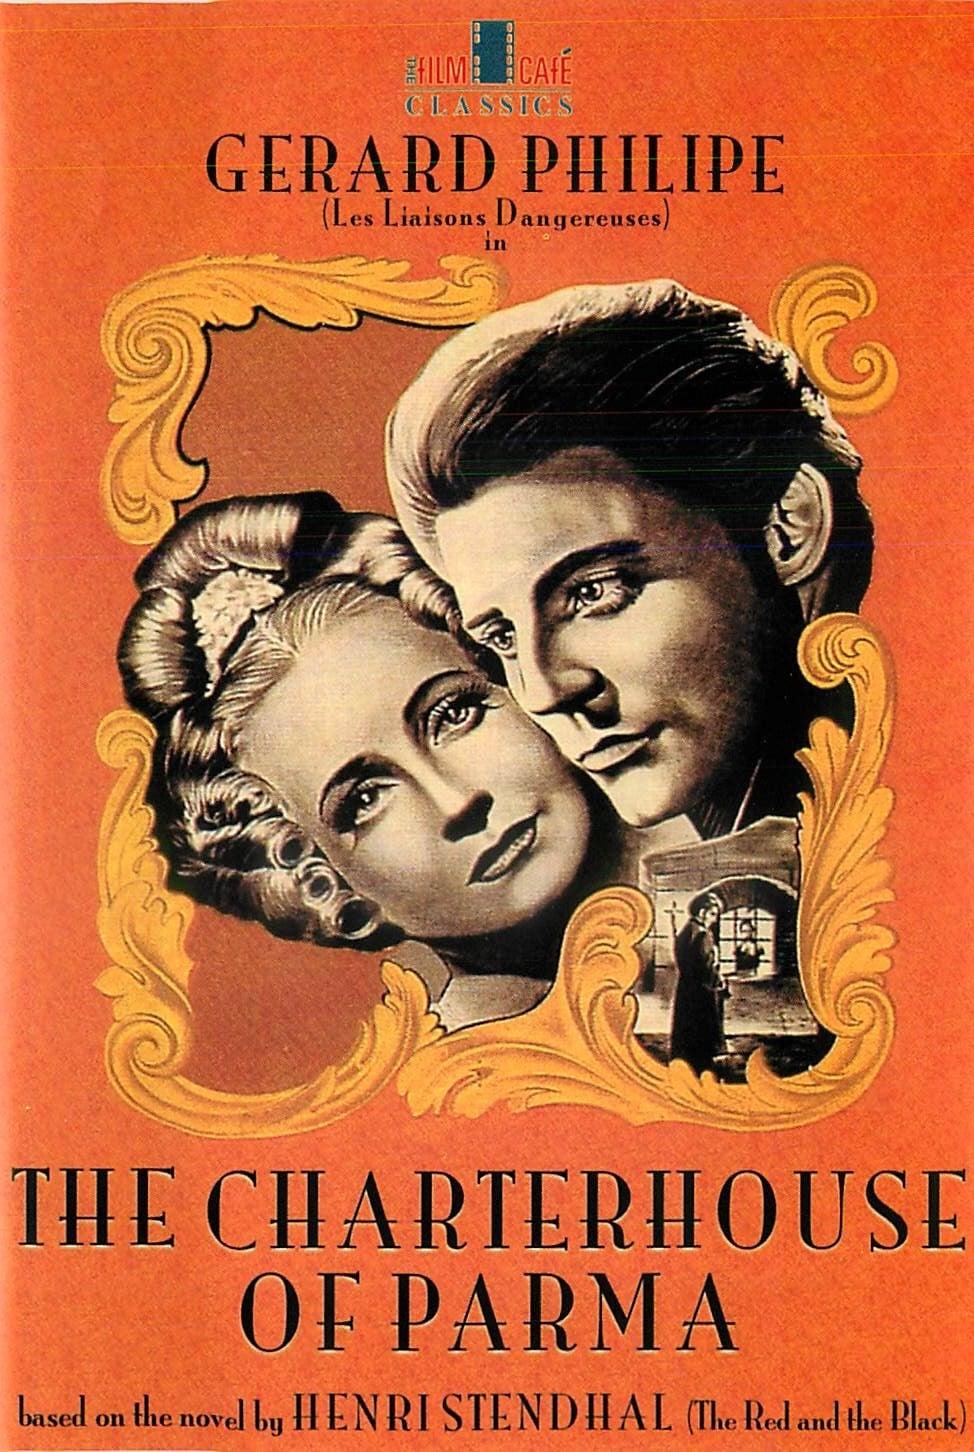 The Charterhouse of Parma (1948)